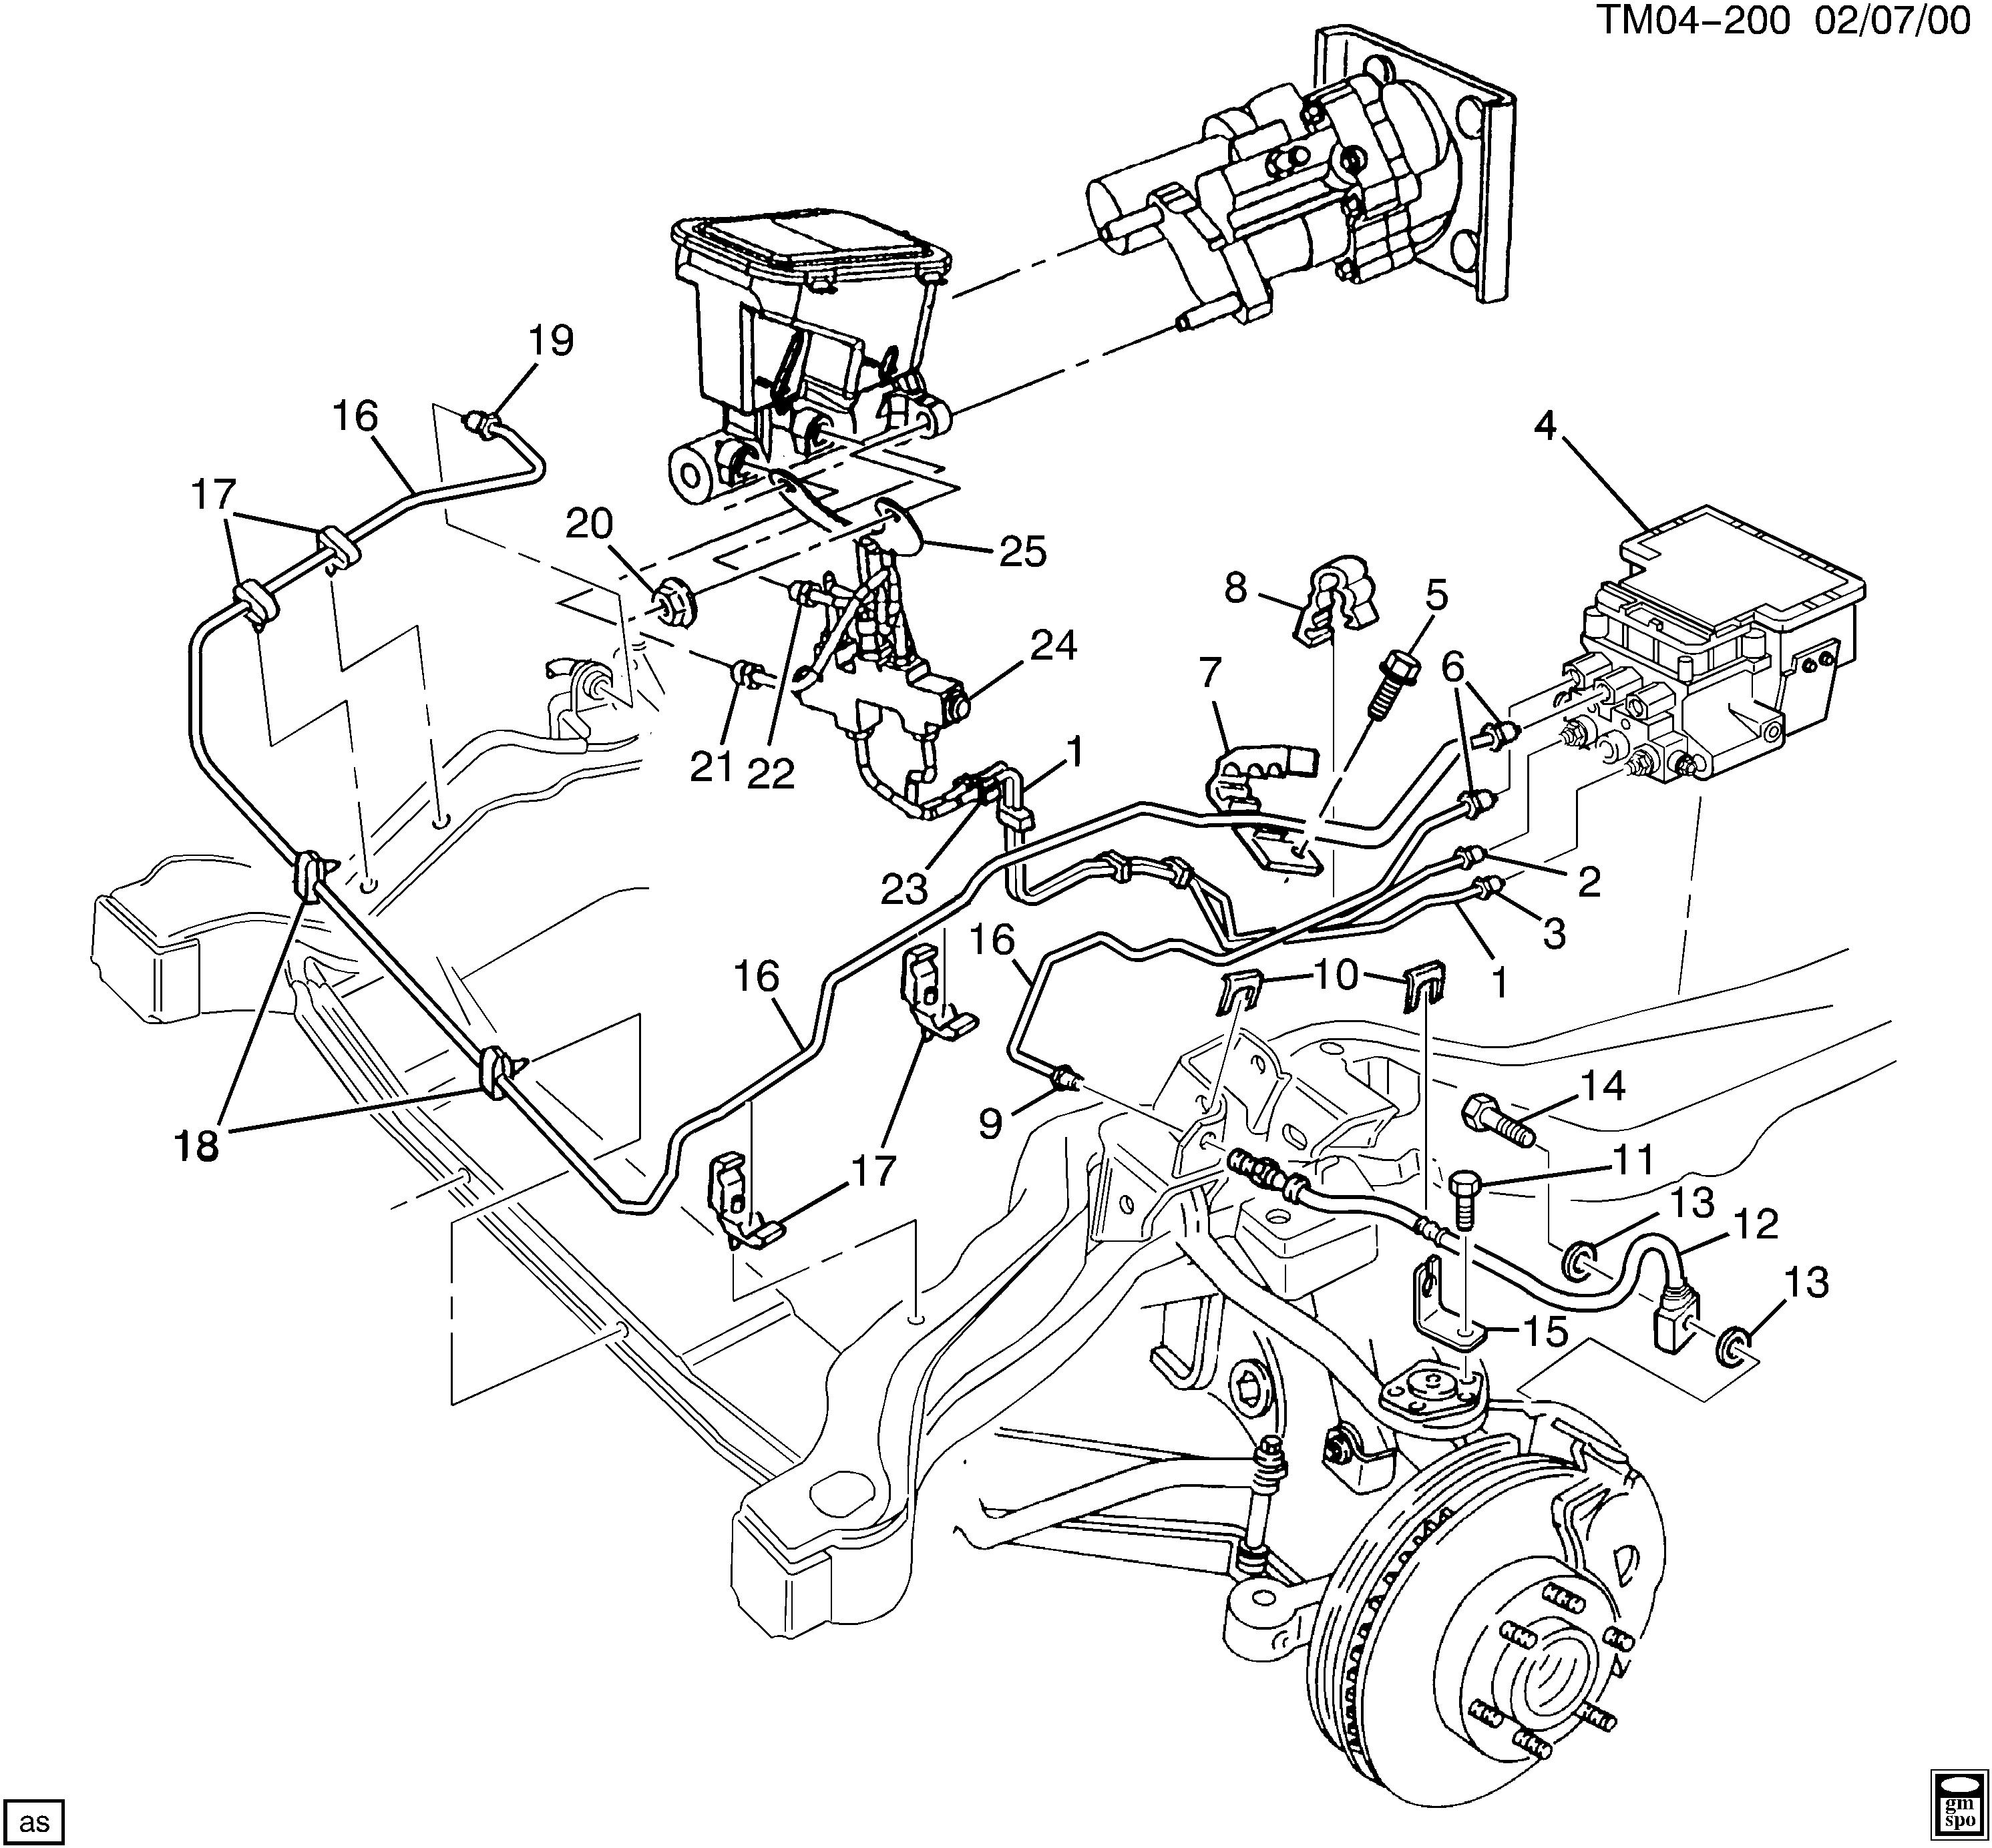 Chevy Astro Brake Line Diagram